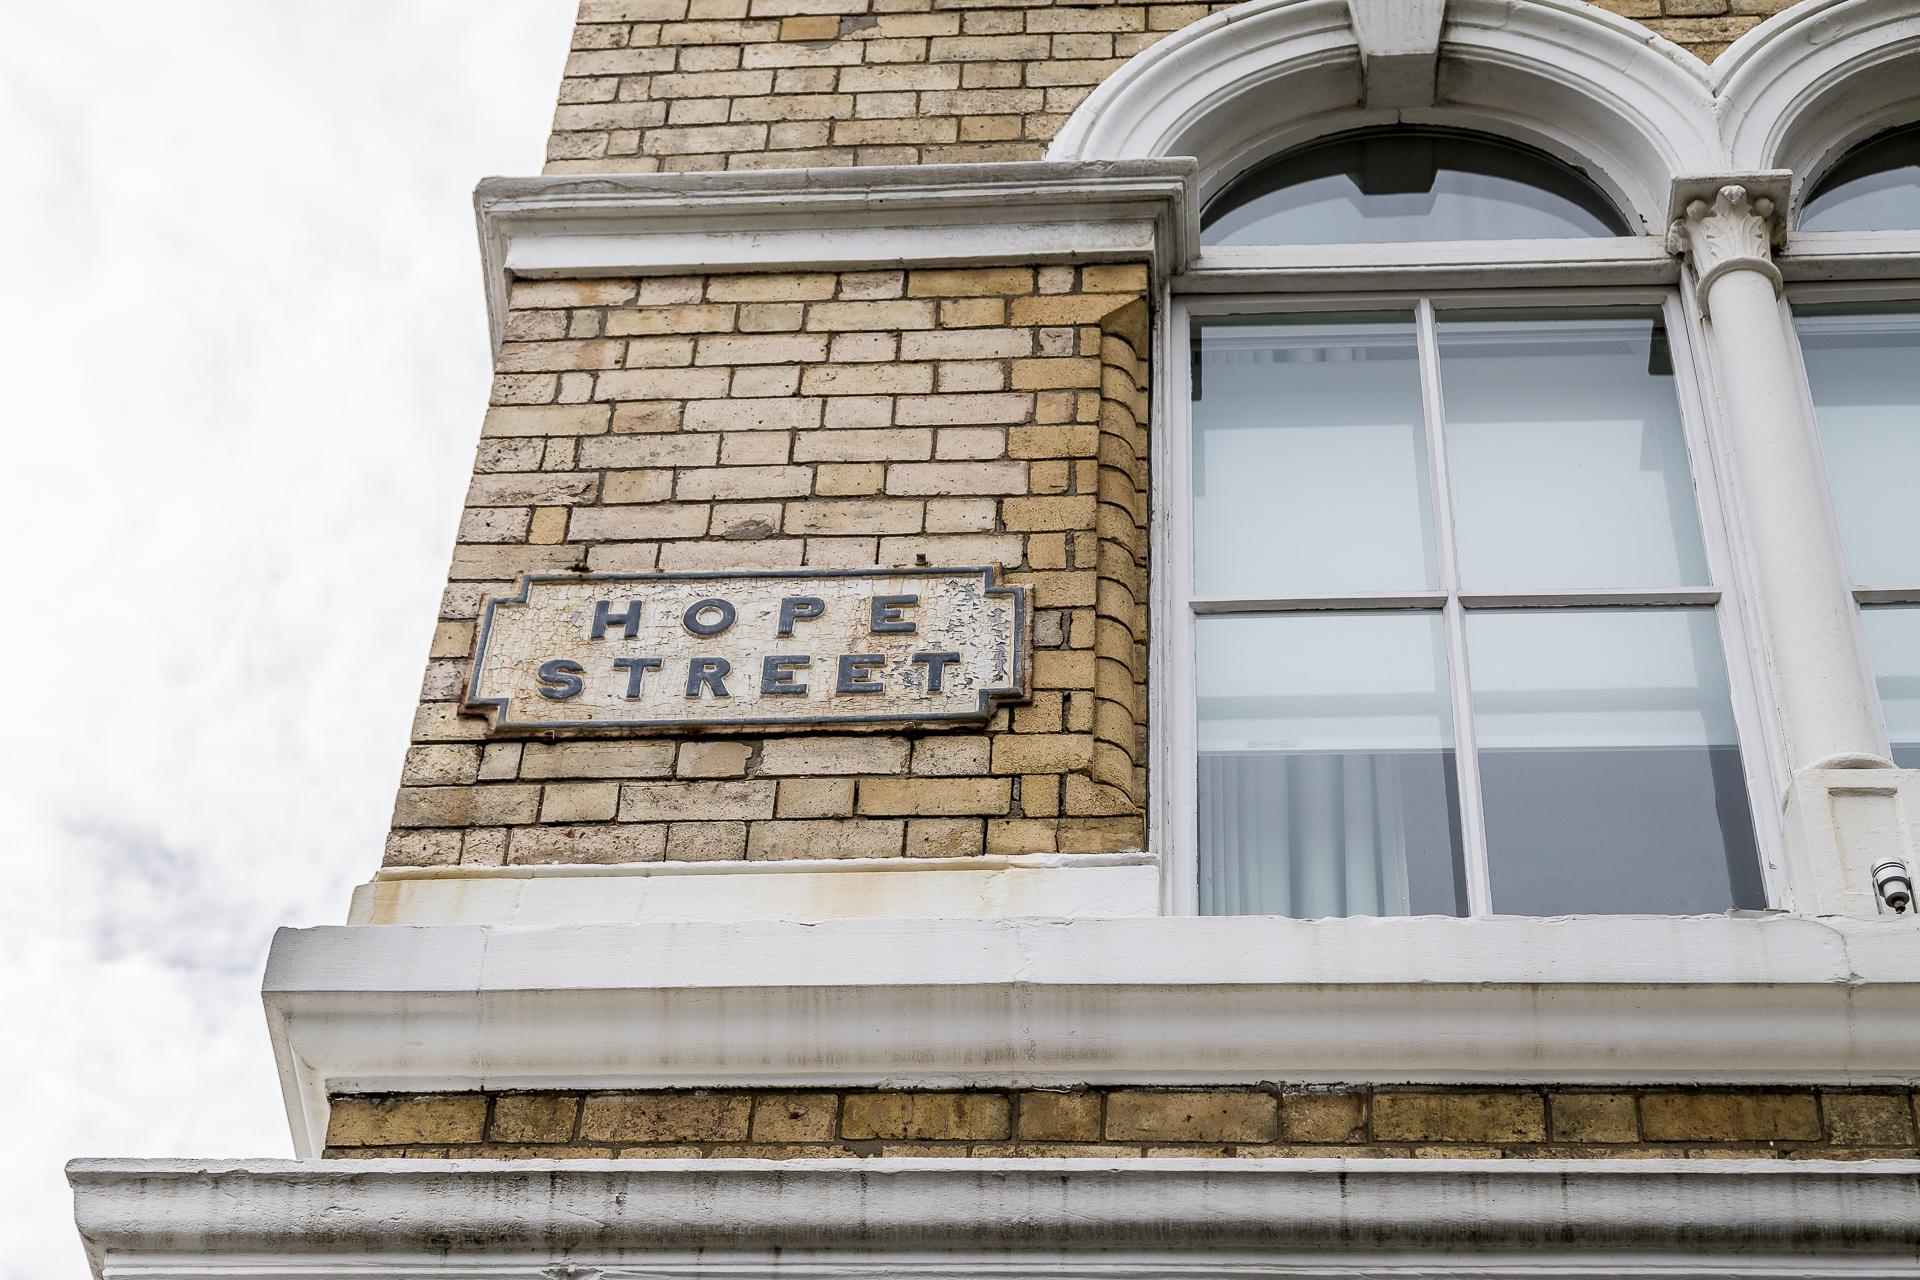 Liverpoo-Hope-Street